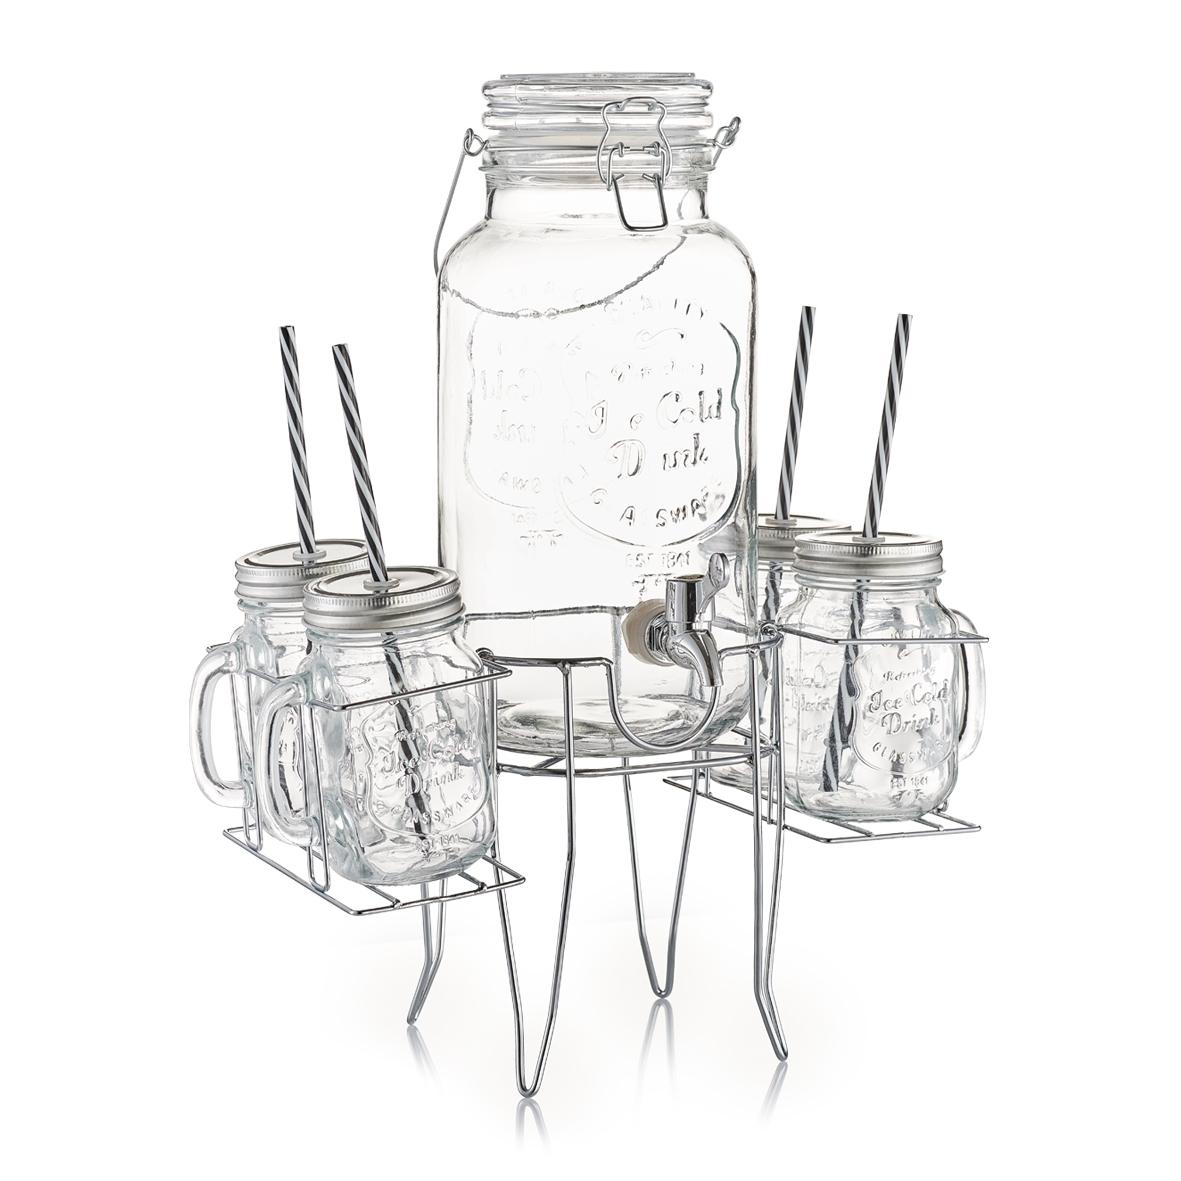 Set dispenser si pahare pentru limonada, cu suport metalic, 6 piese somproduct.ro